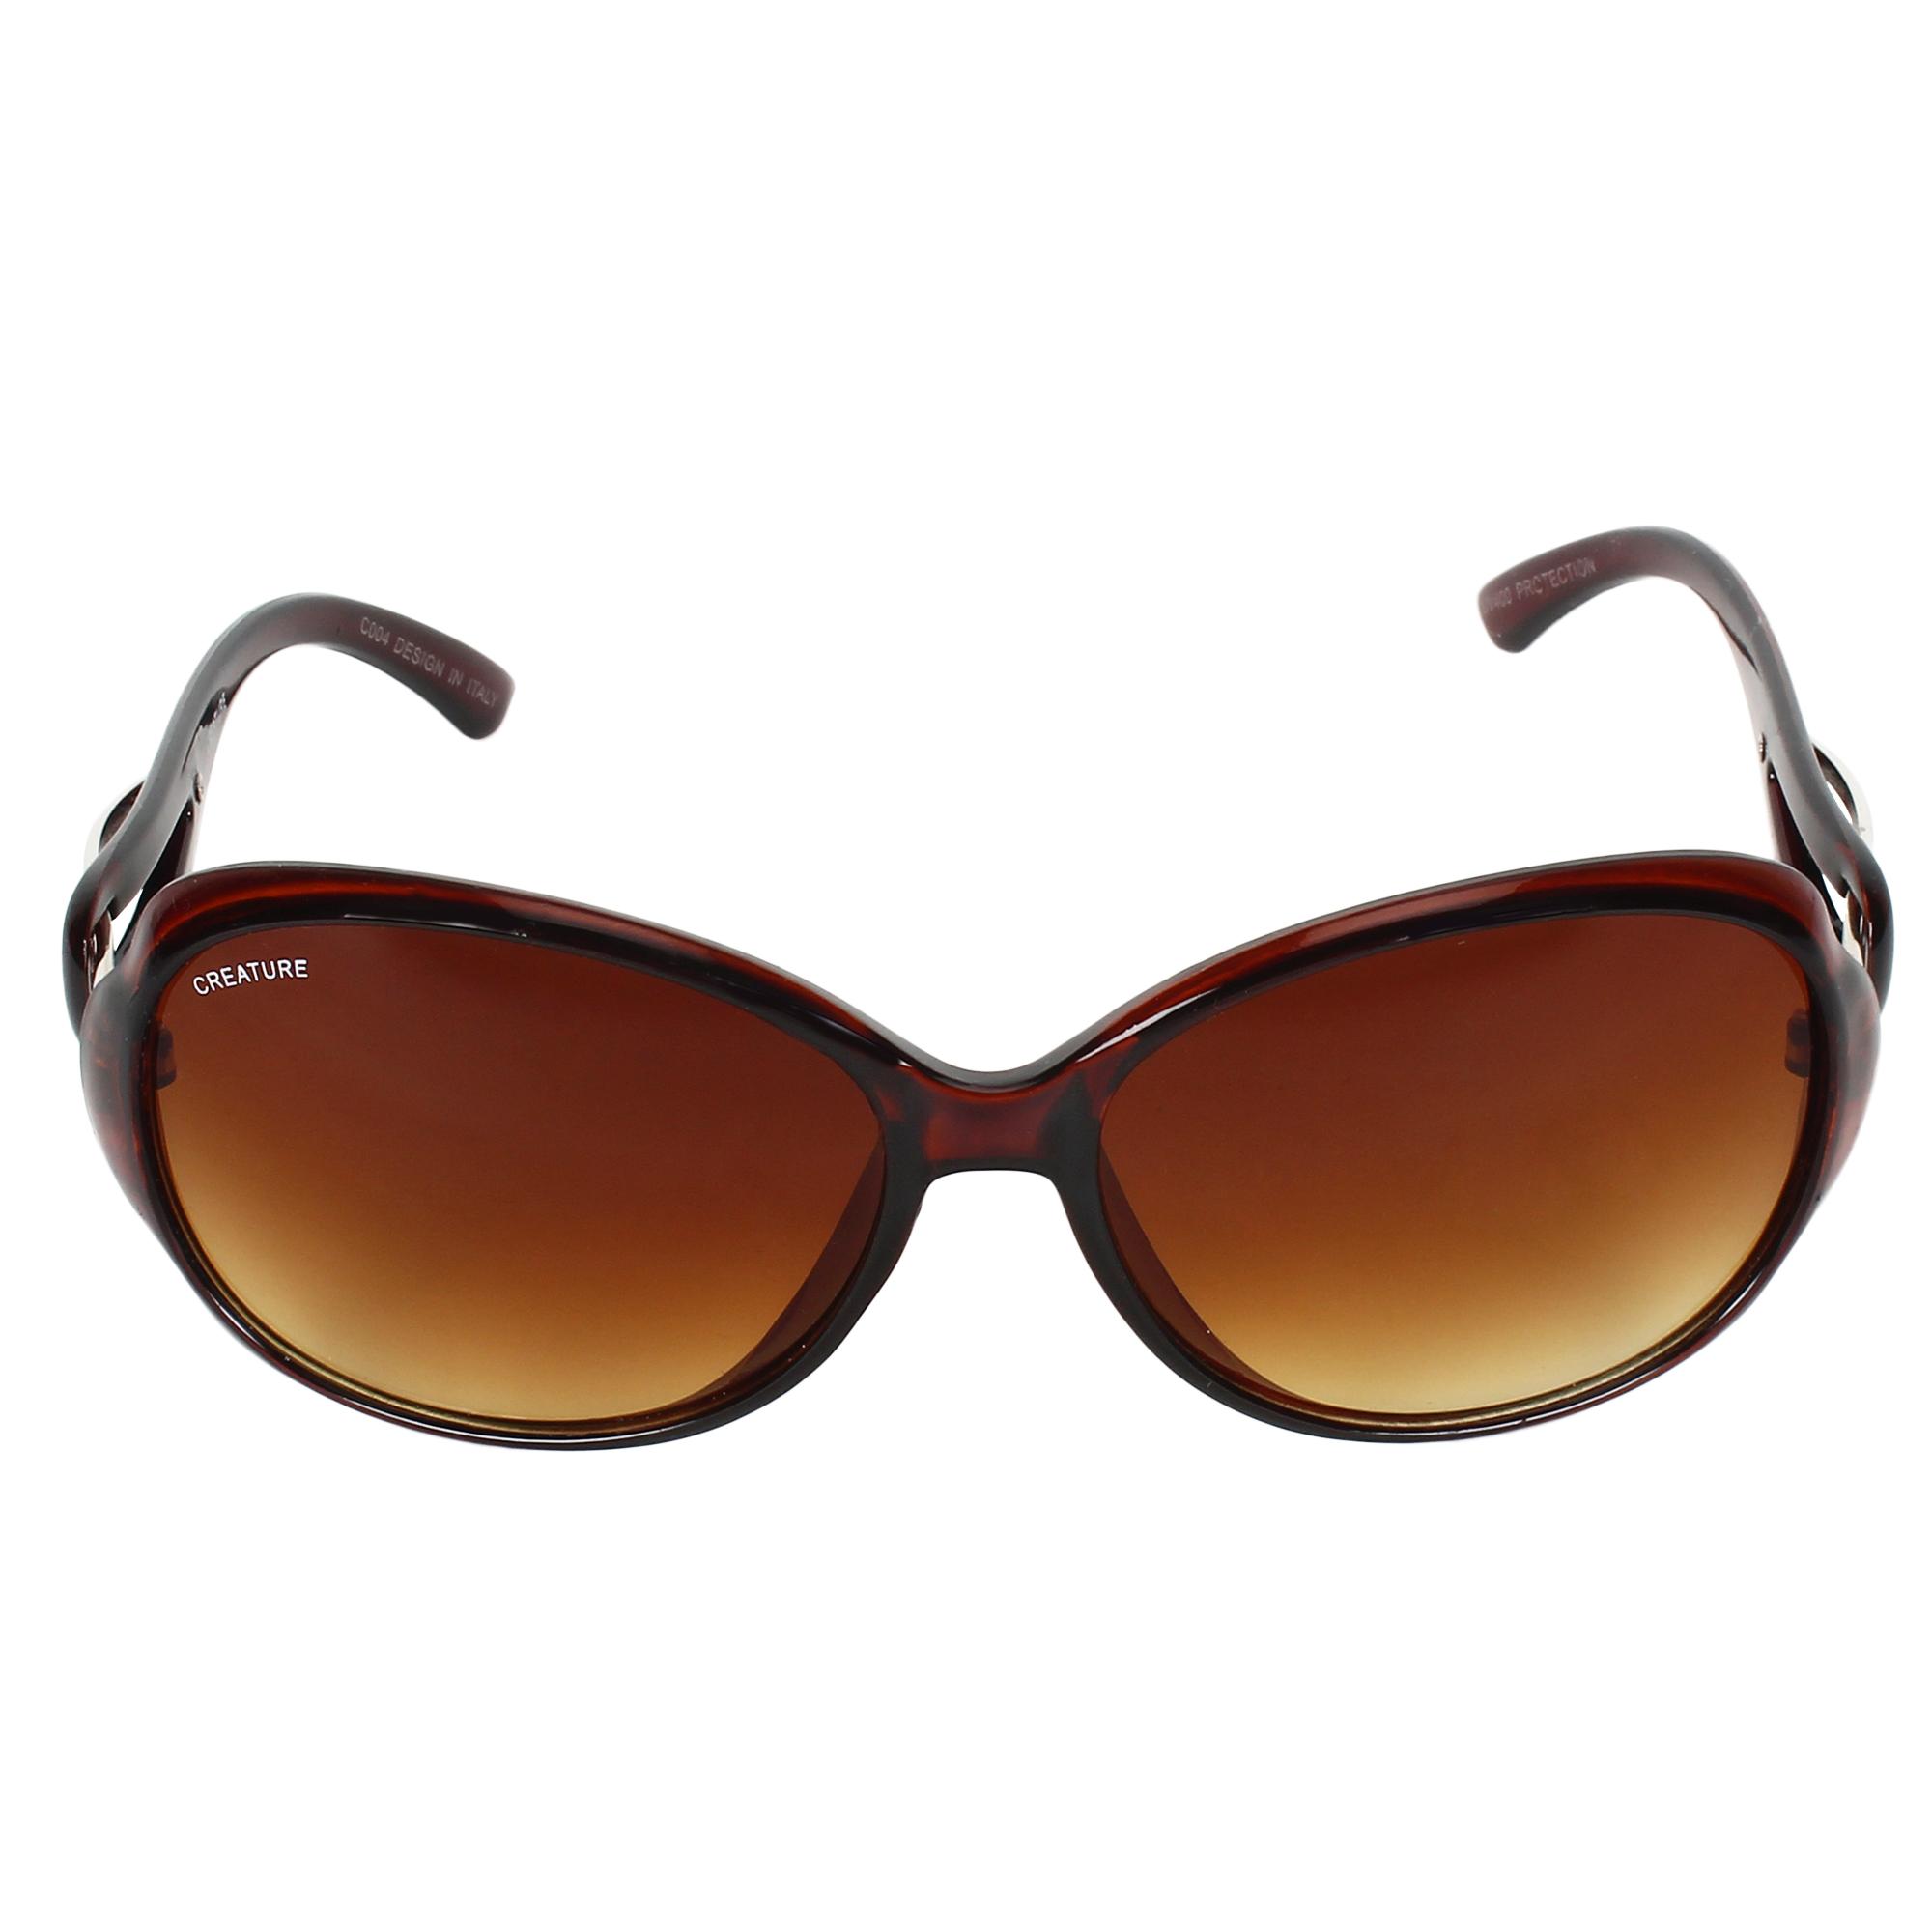 CREATURE | CREATURE Gaga Cat-Eye Oversized Sunglasses For Women (Lens-Brown|Frame-Brown)